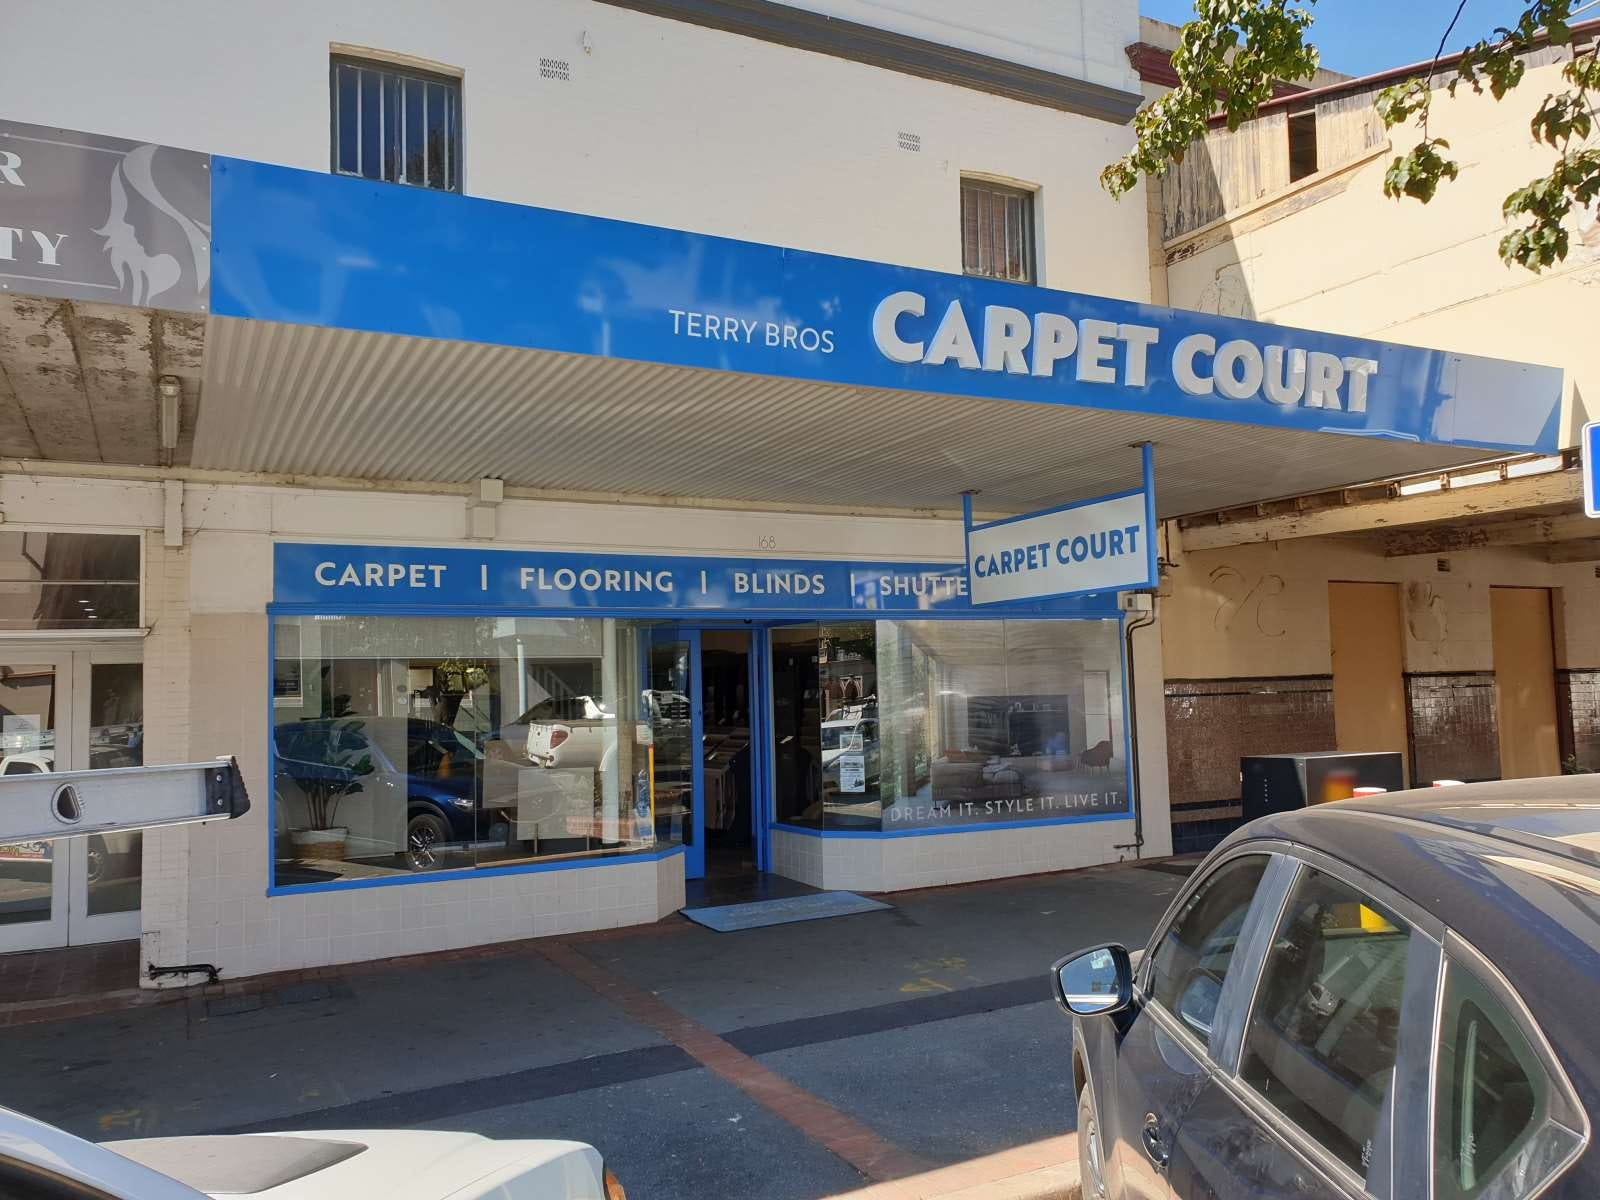 Terry Bros. Carpet Court (Yass)